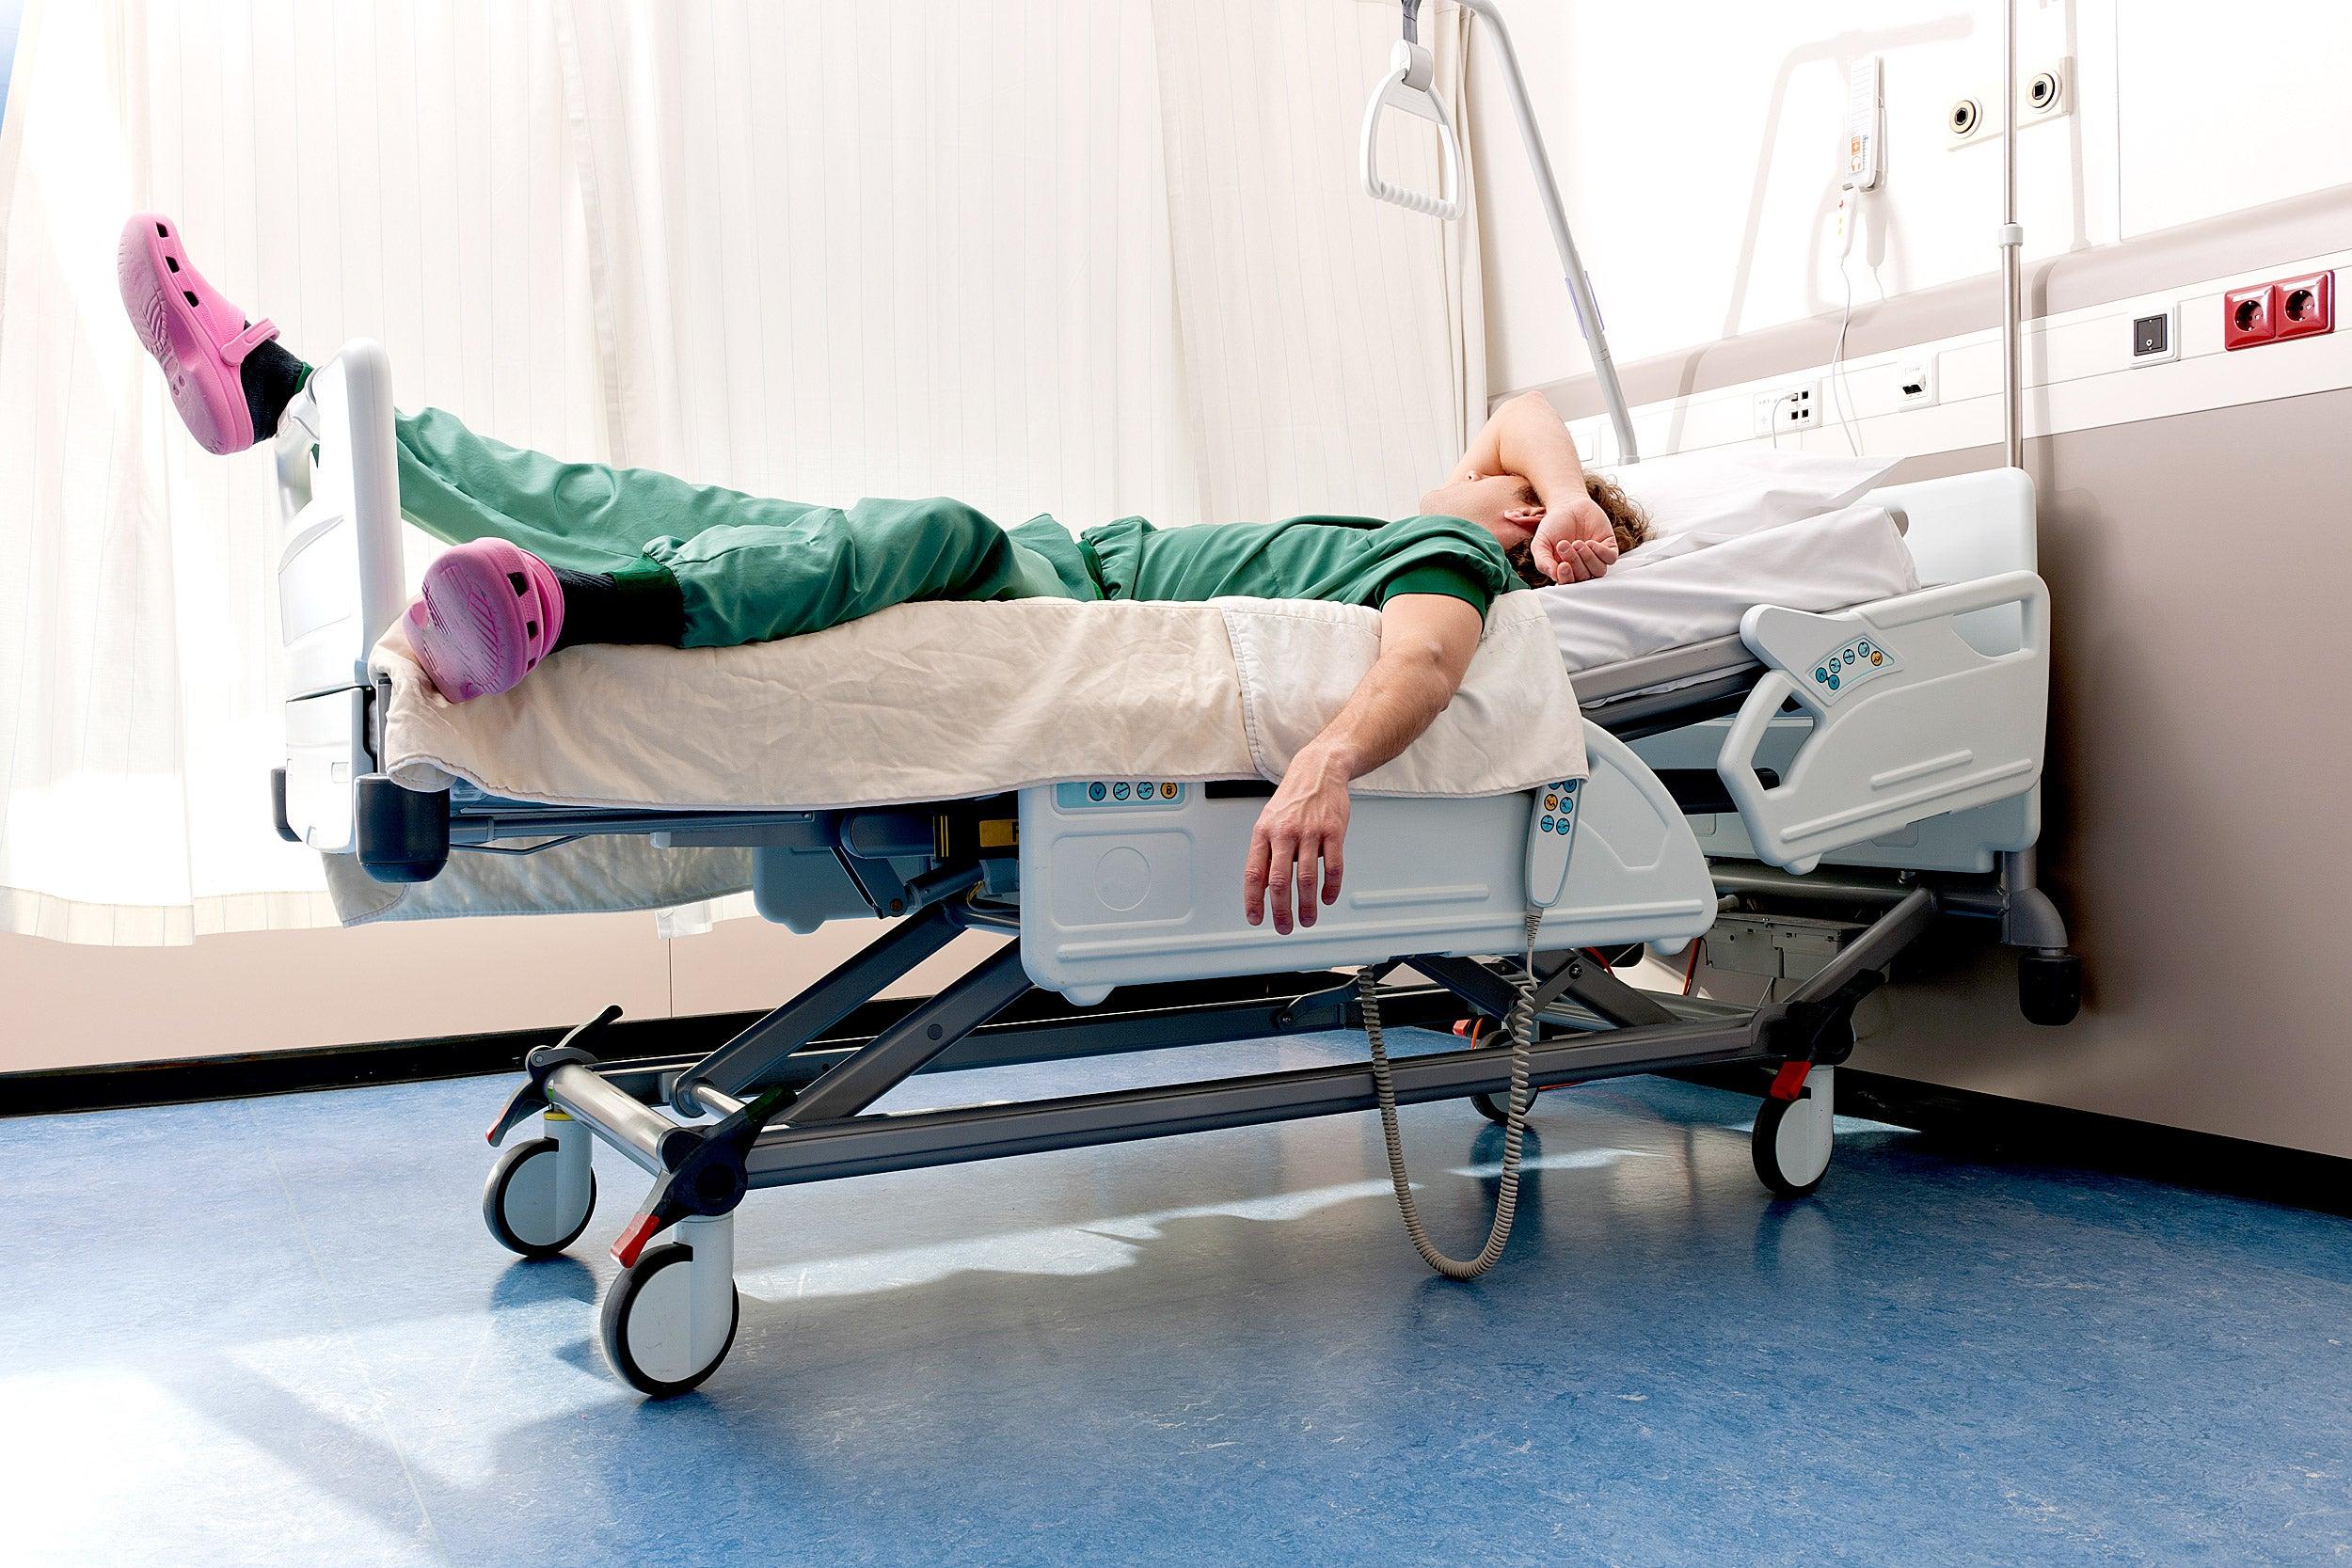 Medical resident sleeping on hospital ward